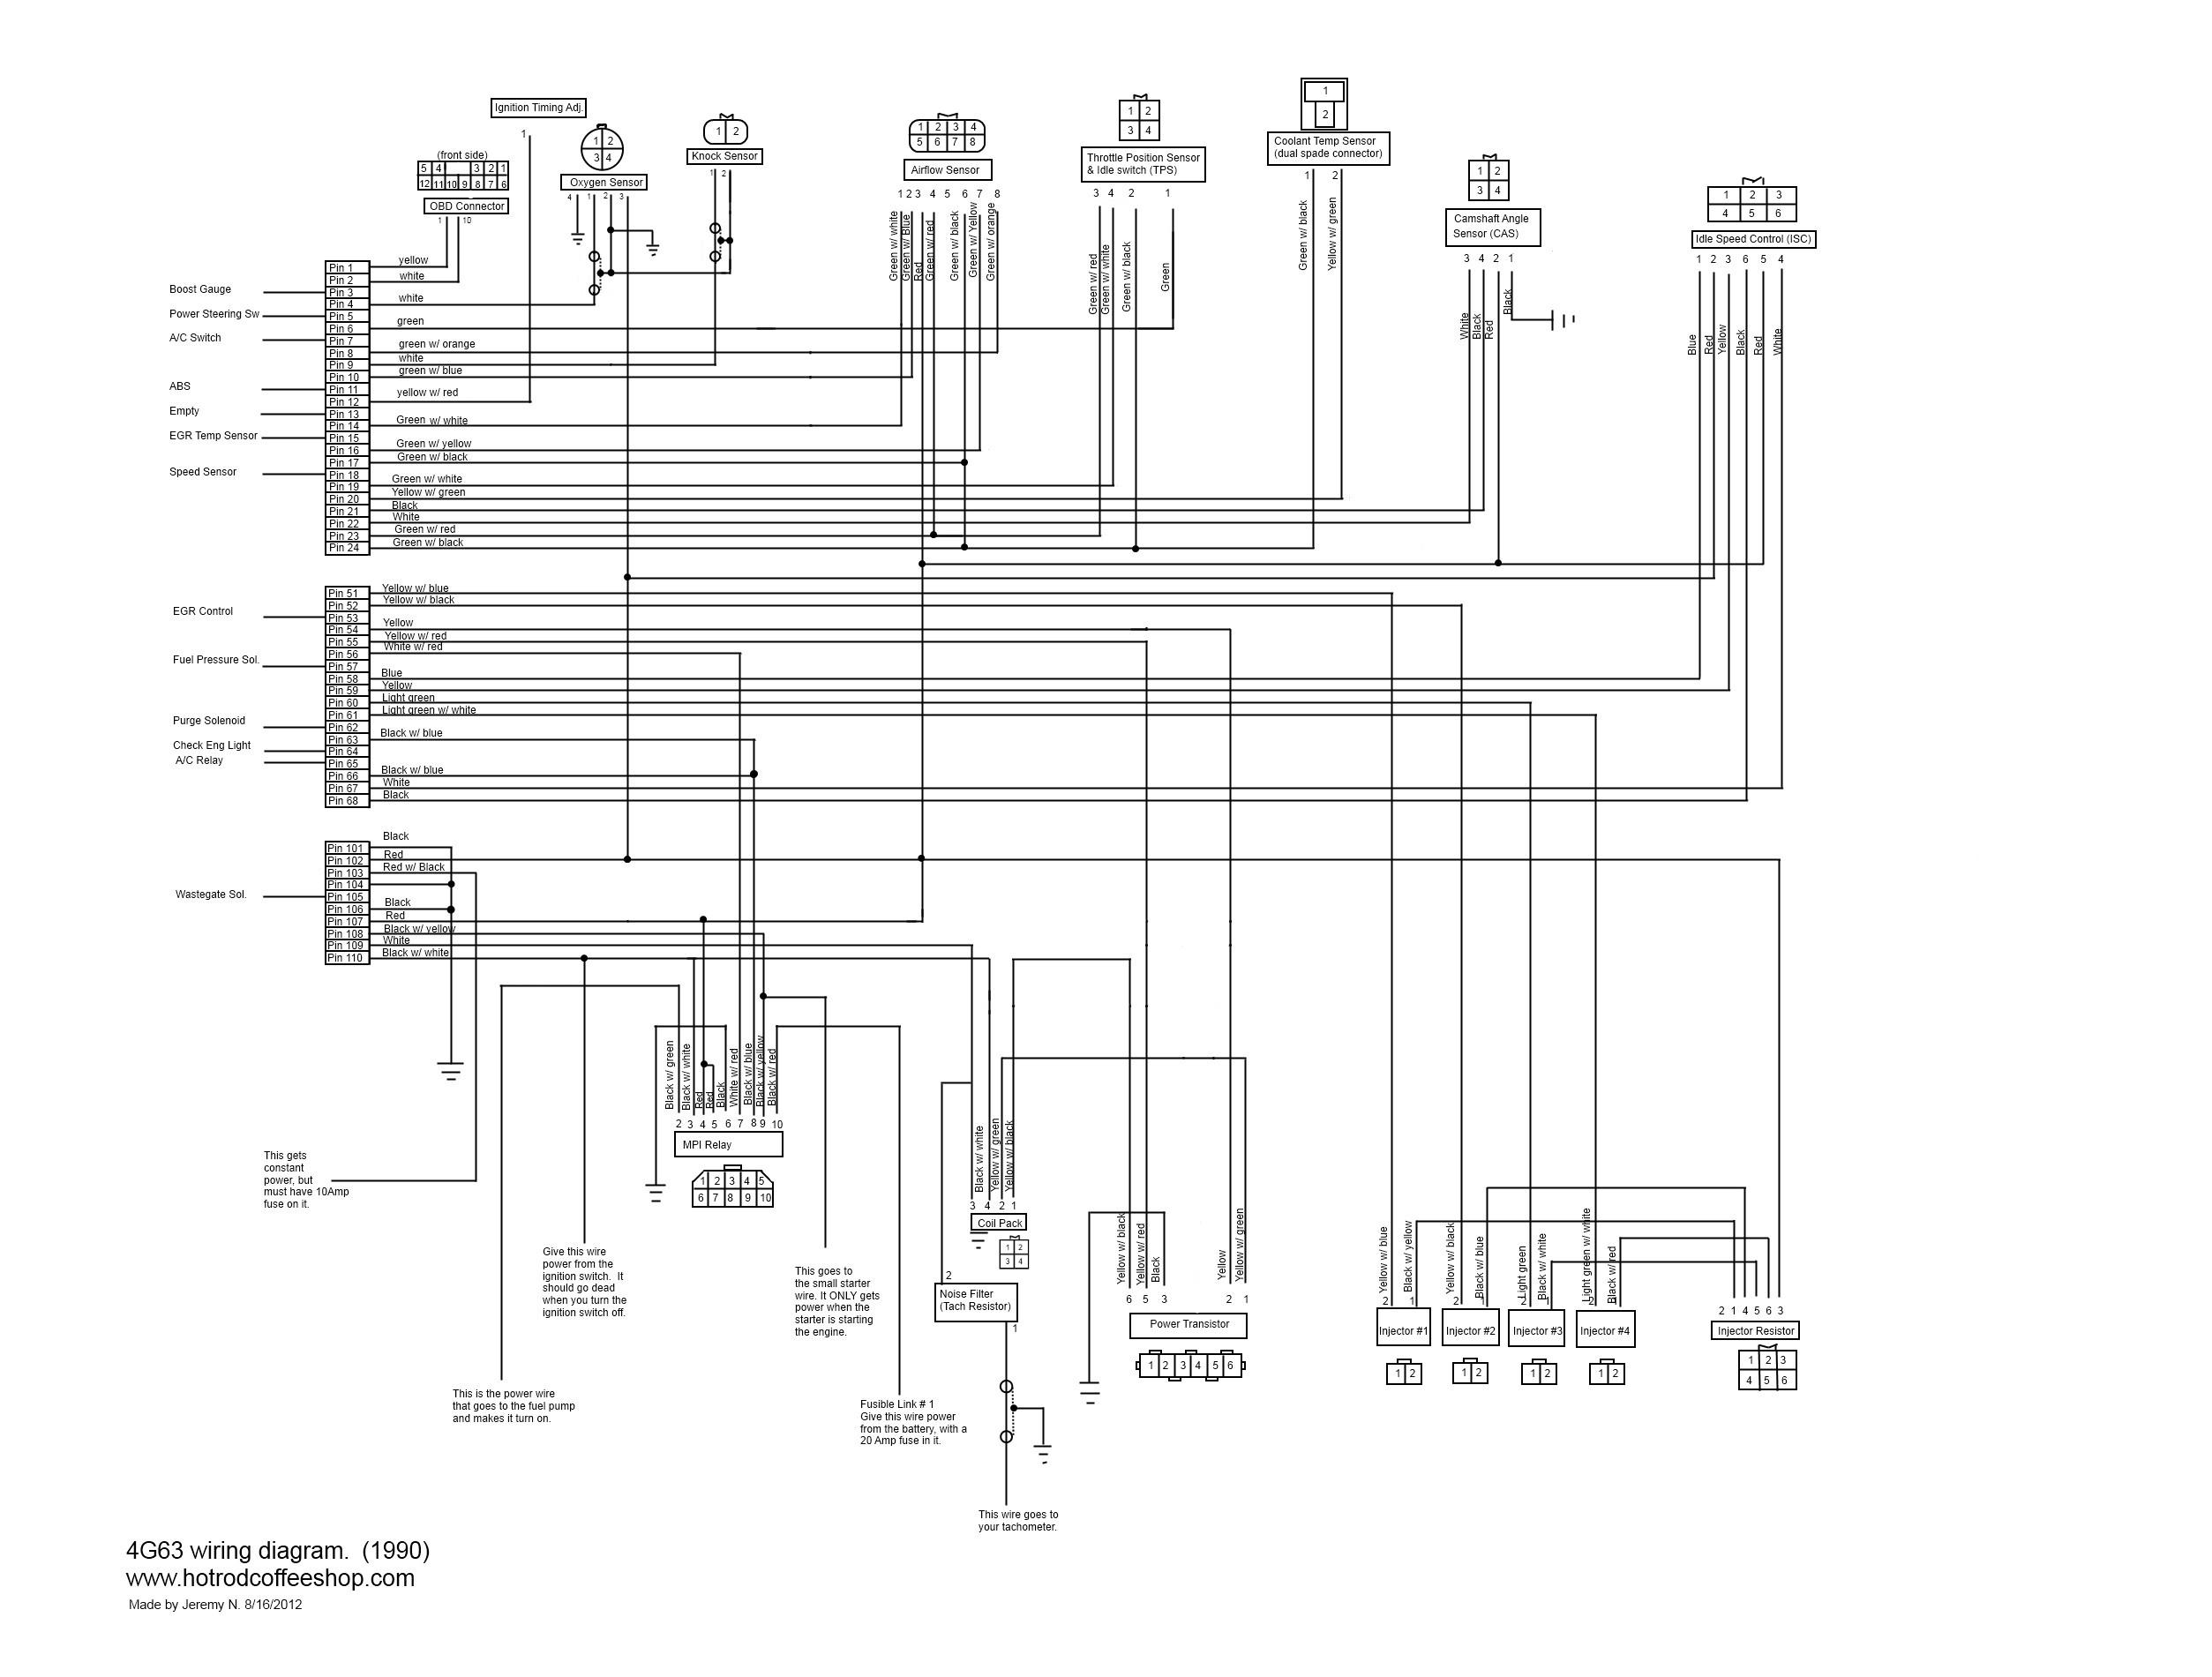 04 mitsubishi coil pack diagram wiring schematic enthusiast wiring rh rasalibre co